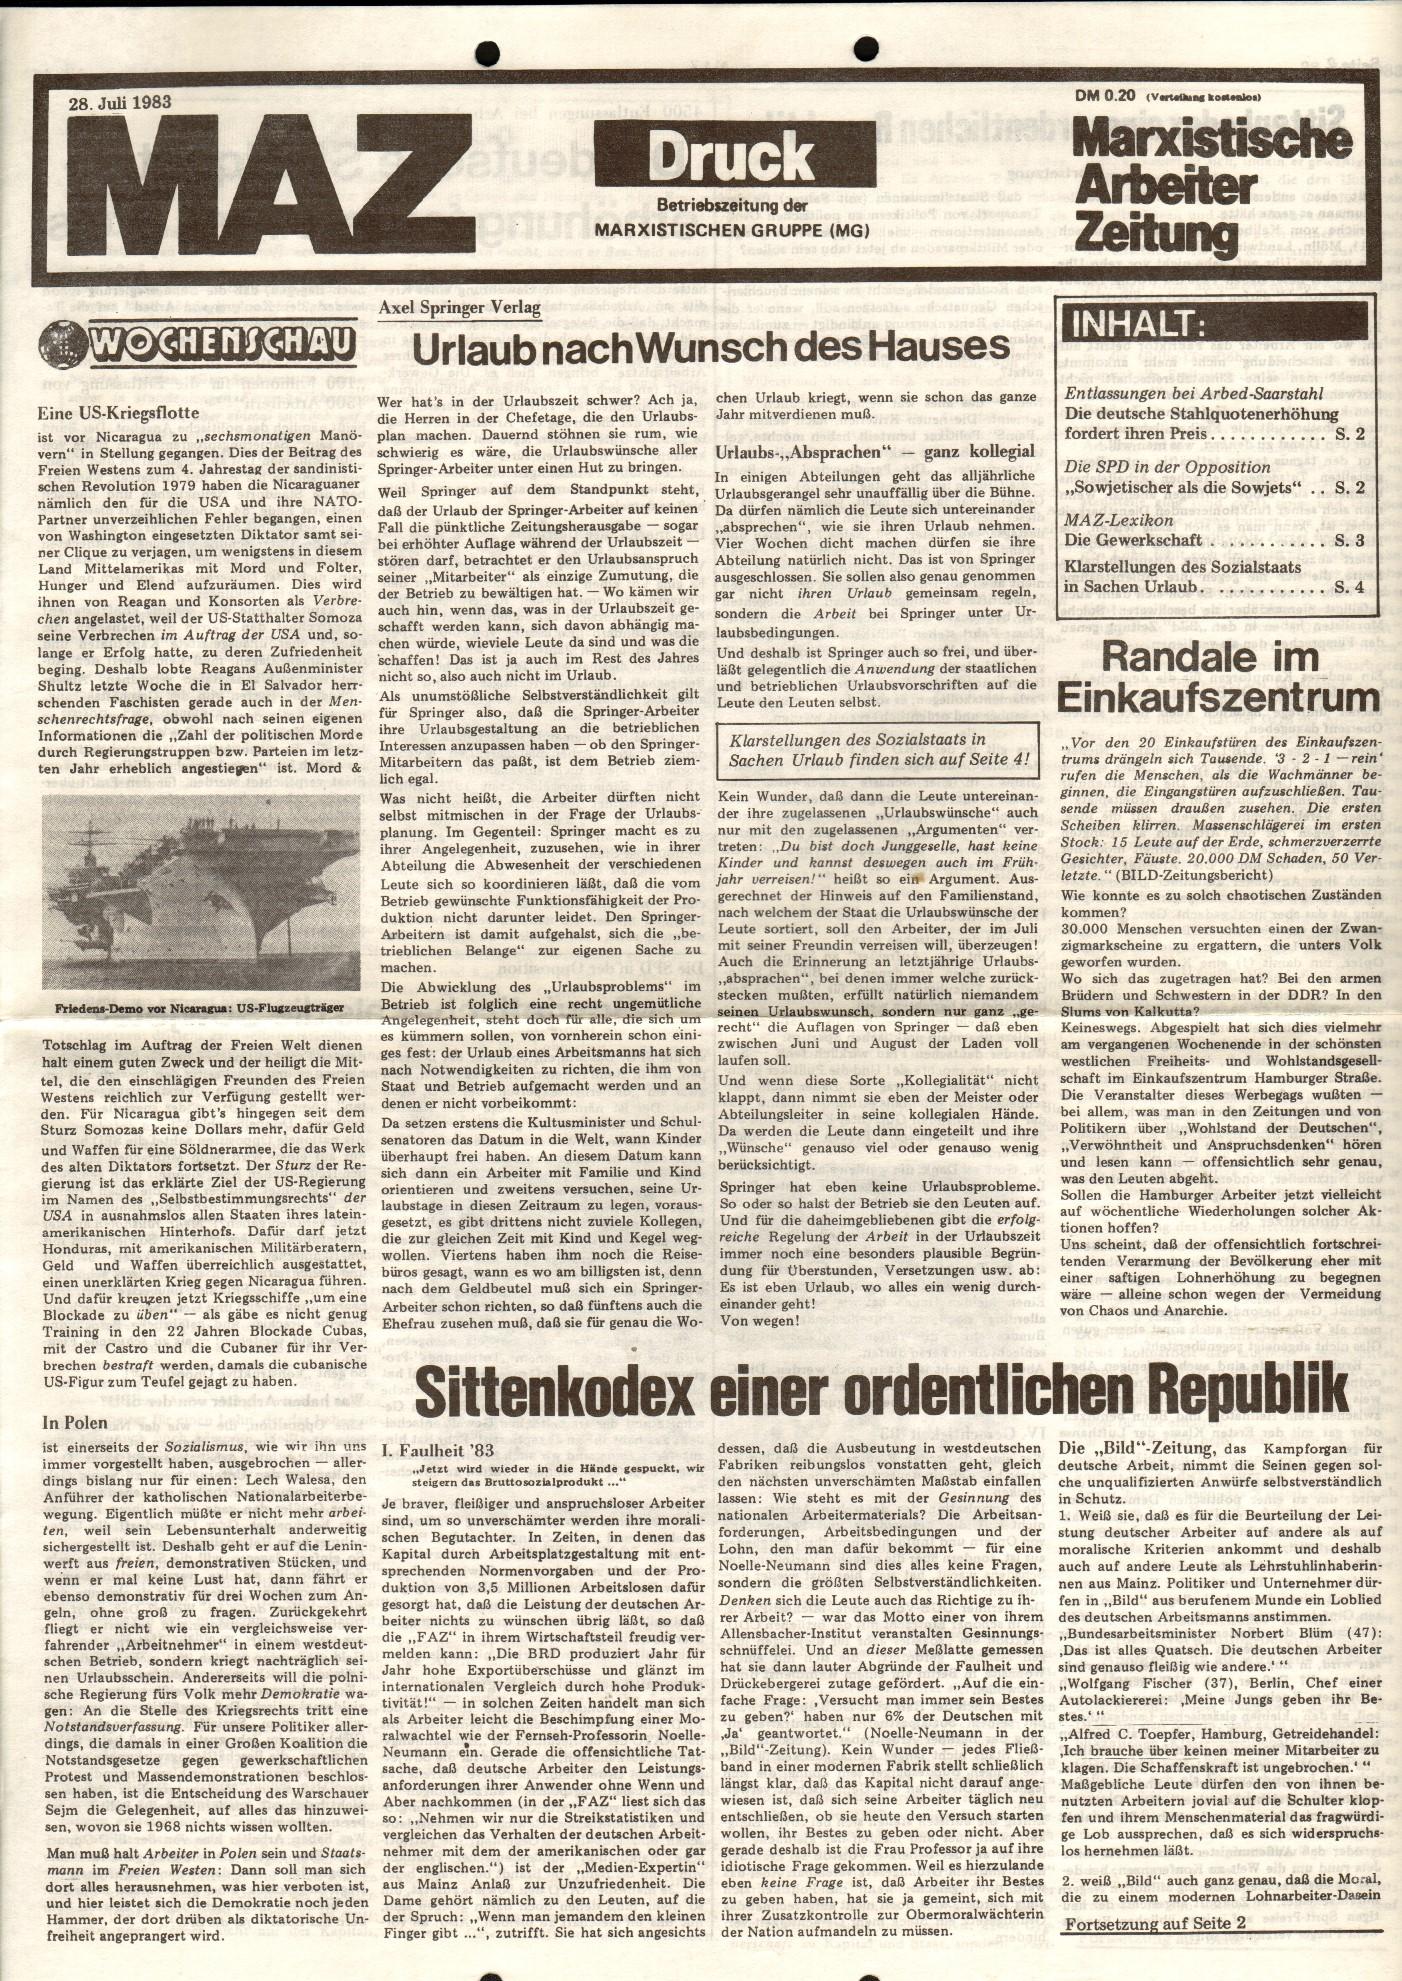 Hamburg_MG_MAZ_Druck_19830728_01